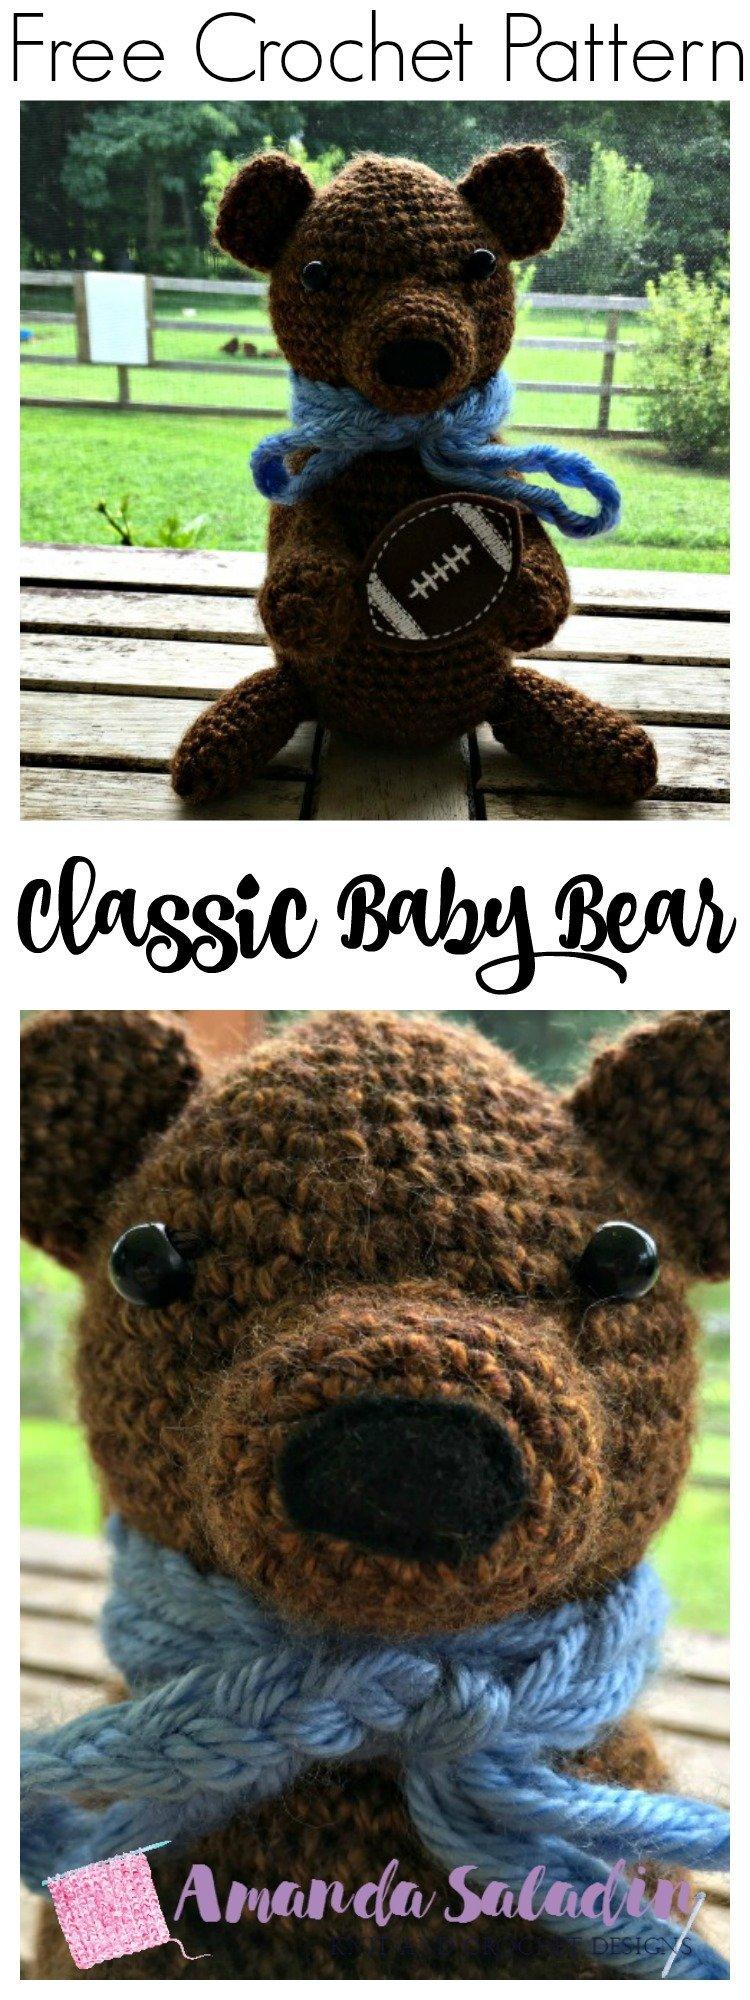 Free Crochet Pattern - Classic Baby Bear by Amanda Saladin